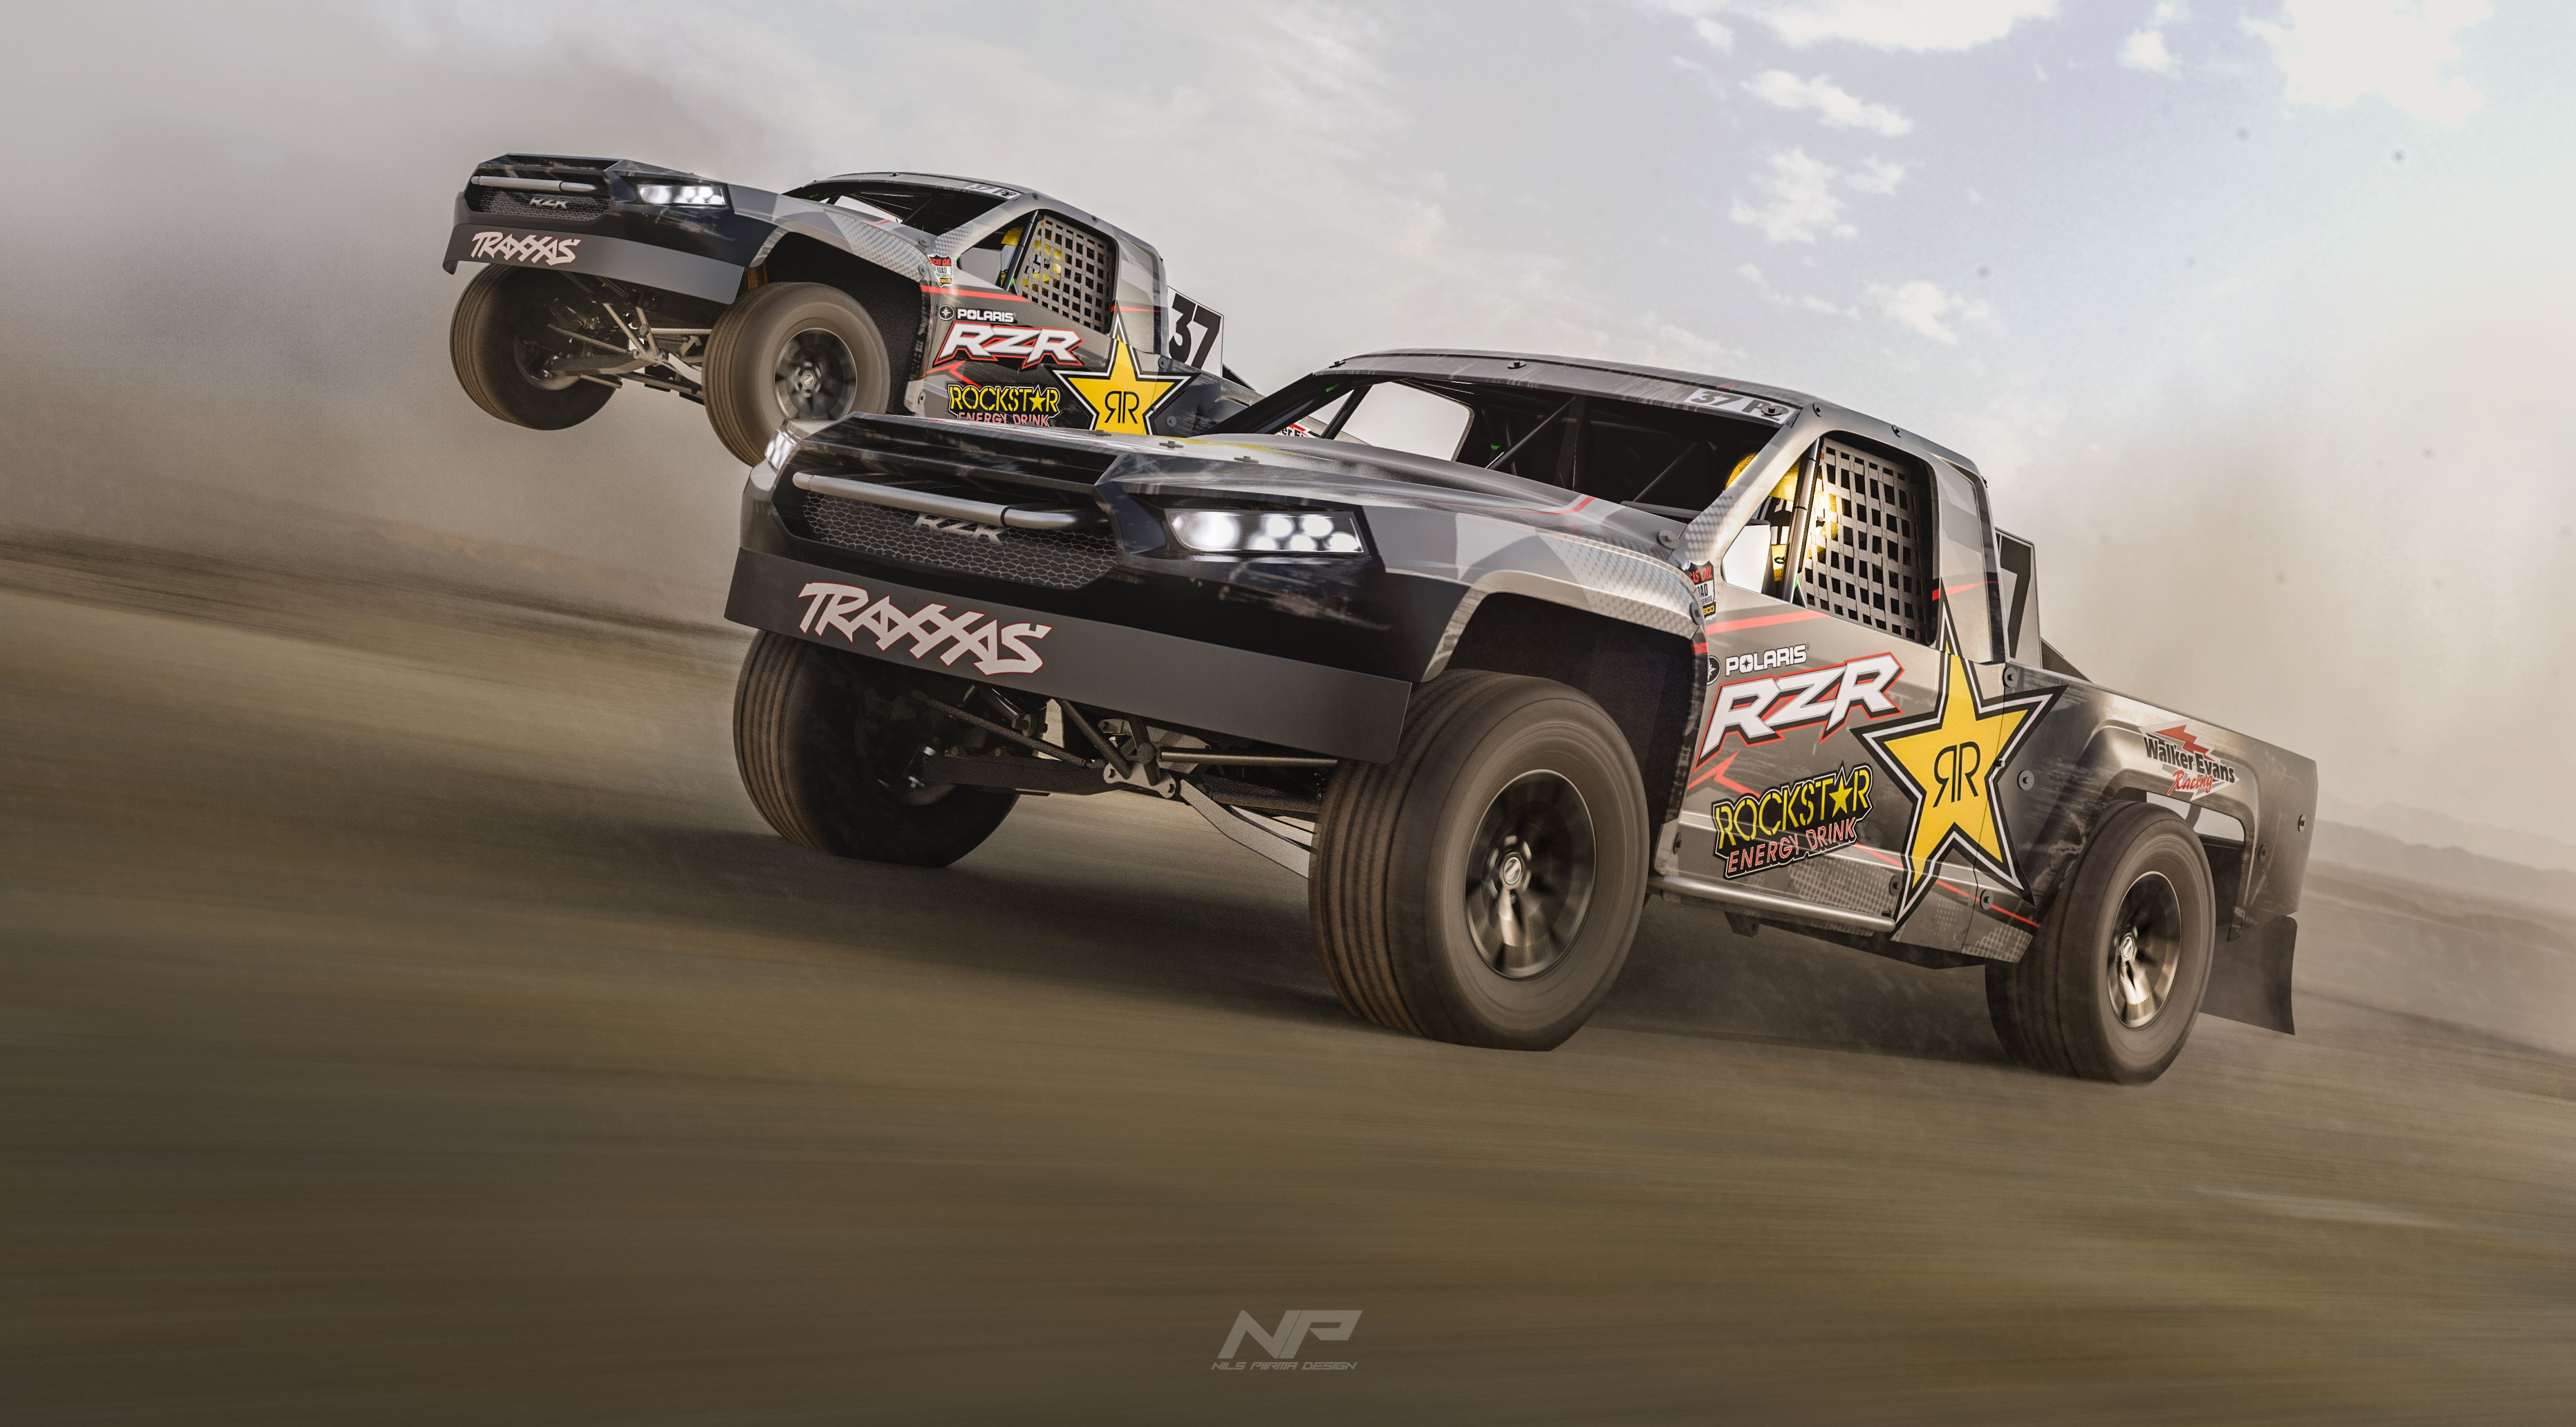 Traxxas Trophy Trucks Racing In The Desert Rendered In Keyshot By Nils Piirma Trophy Truck Trucks Racing